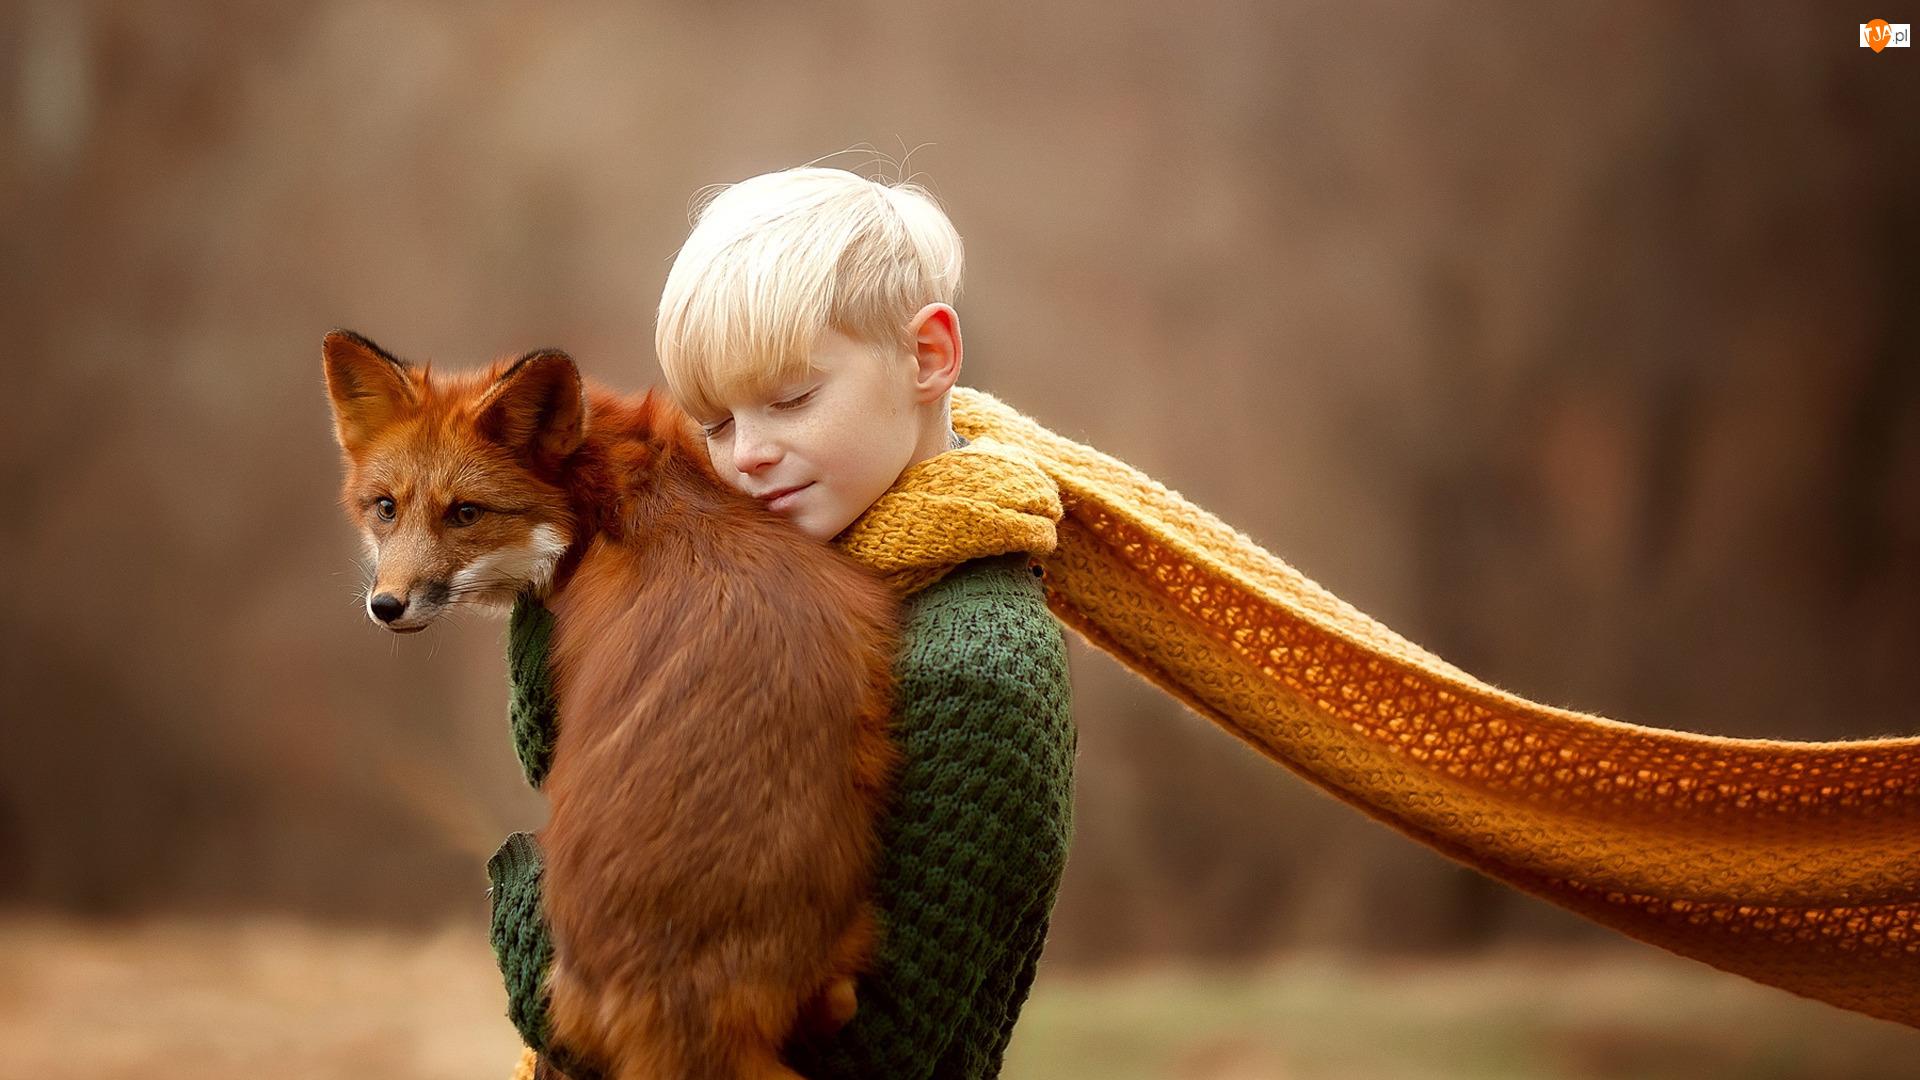 Lis, Chłopiec, Szalik